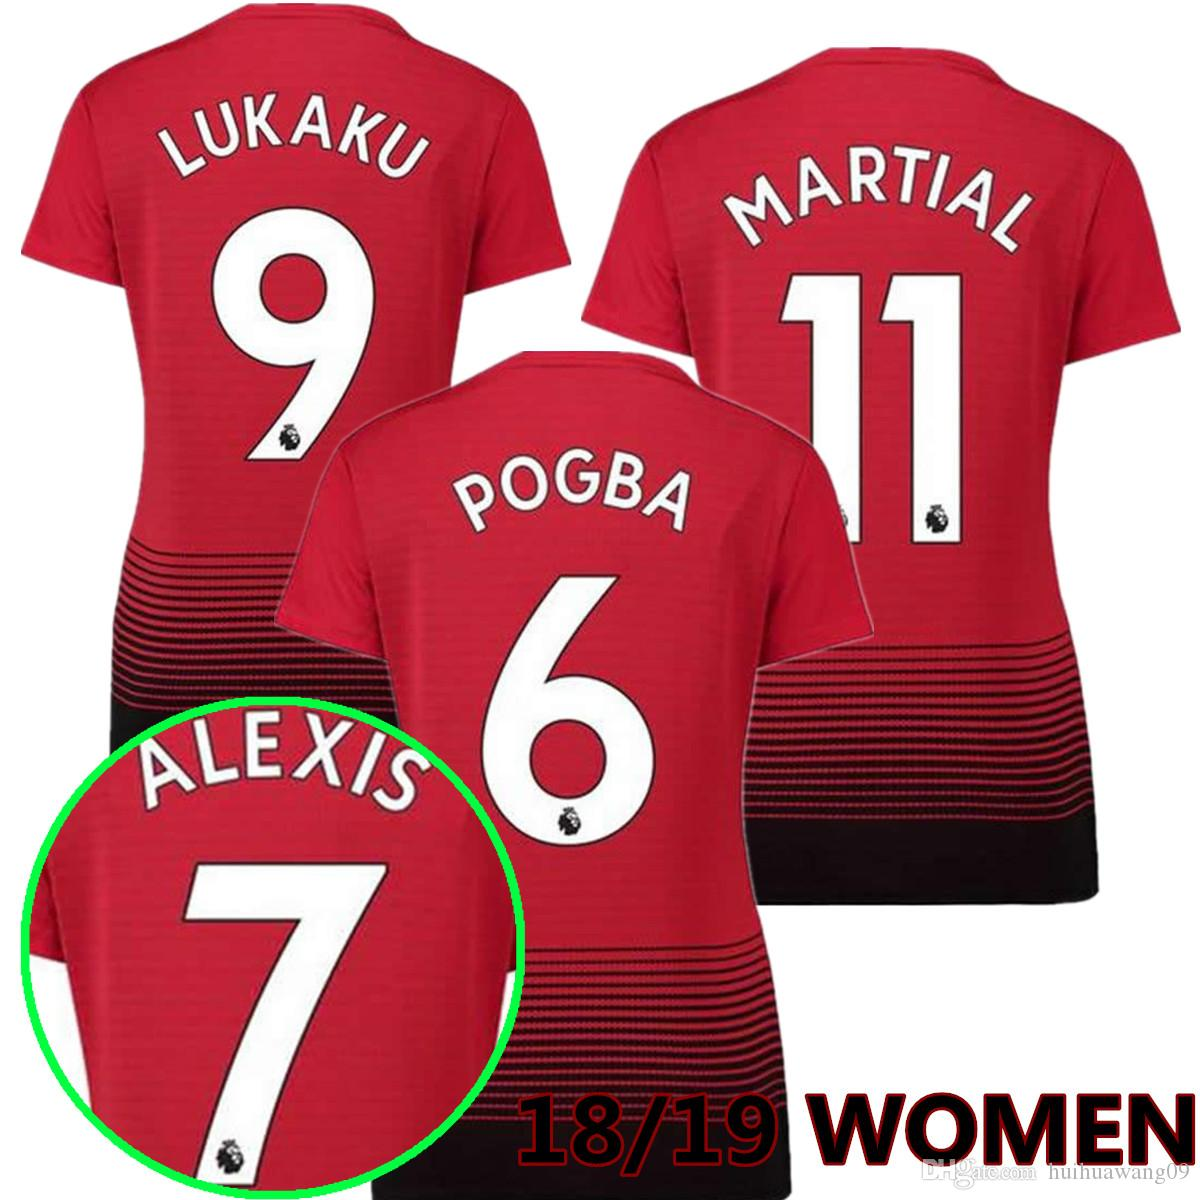 18 19 Women POGBA Red Devil Soccer Jersey 2018 19 LUKAKU 7 ALEXIS Shirt  Girl LINGARD RASHFORD MATA Ashley Young Football Shirt Sales Maillot De  Foot ... ba8497425